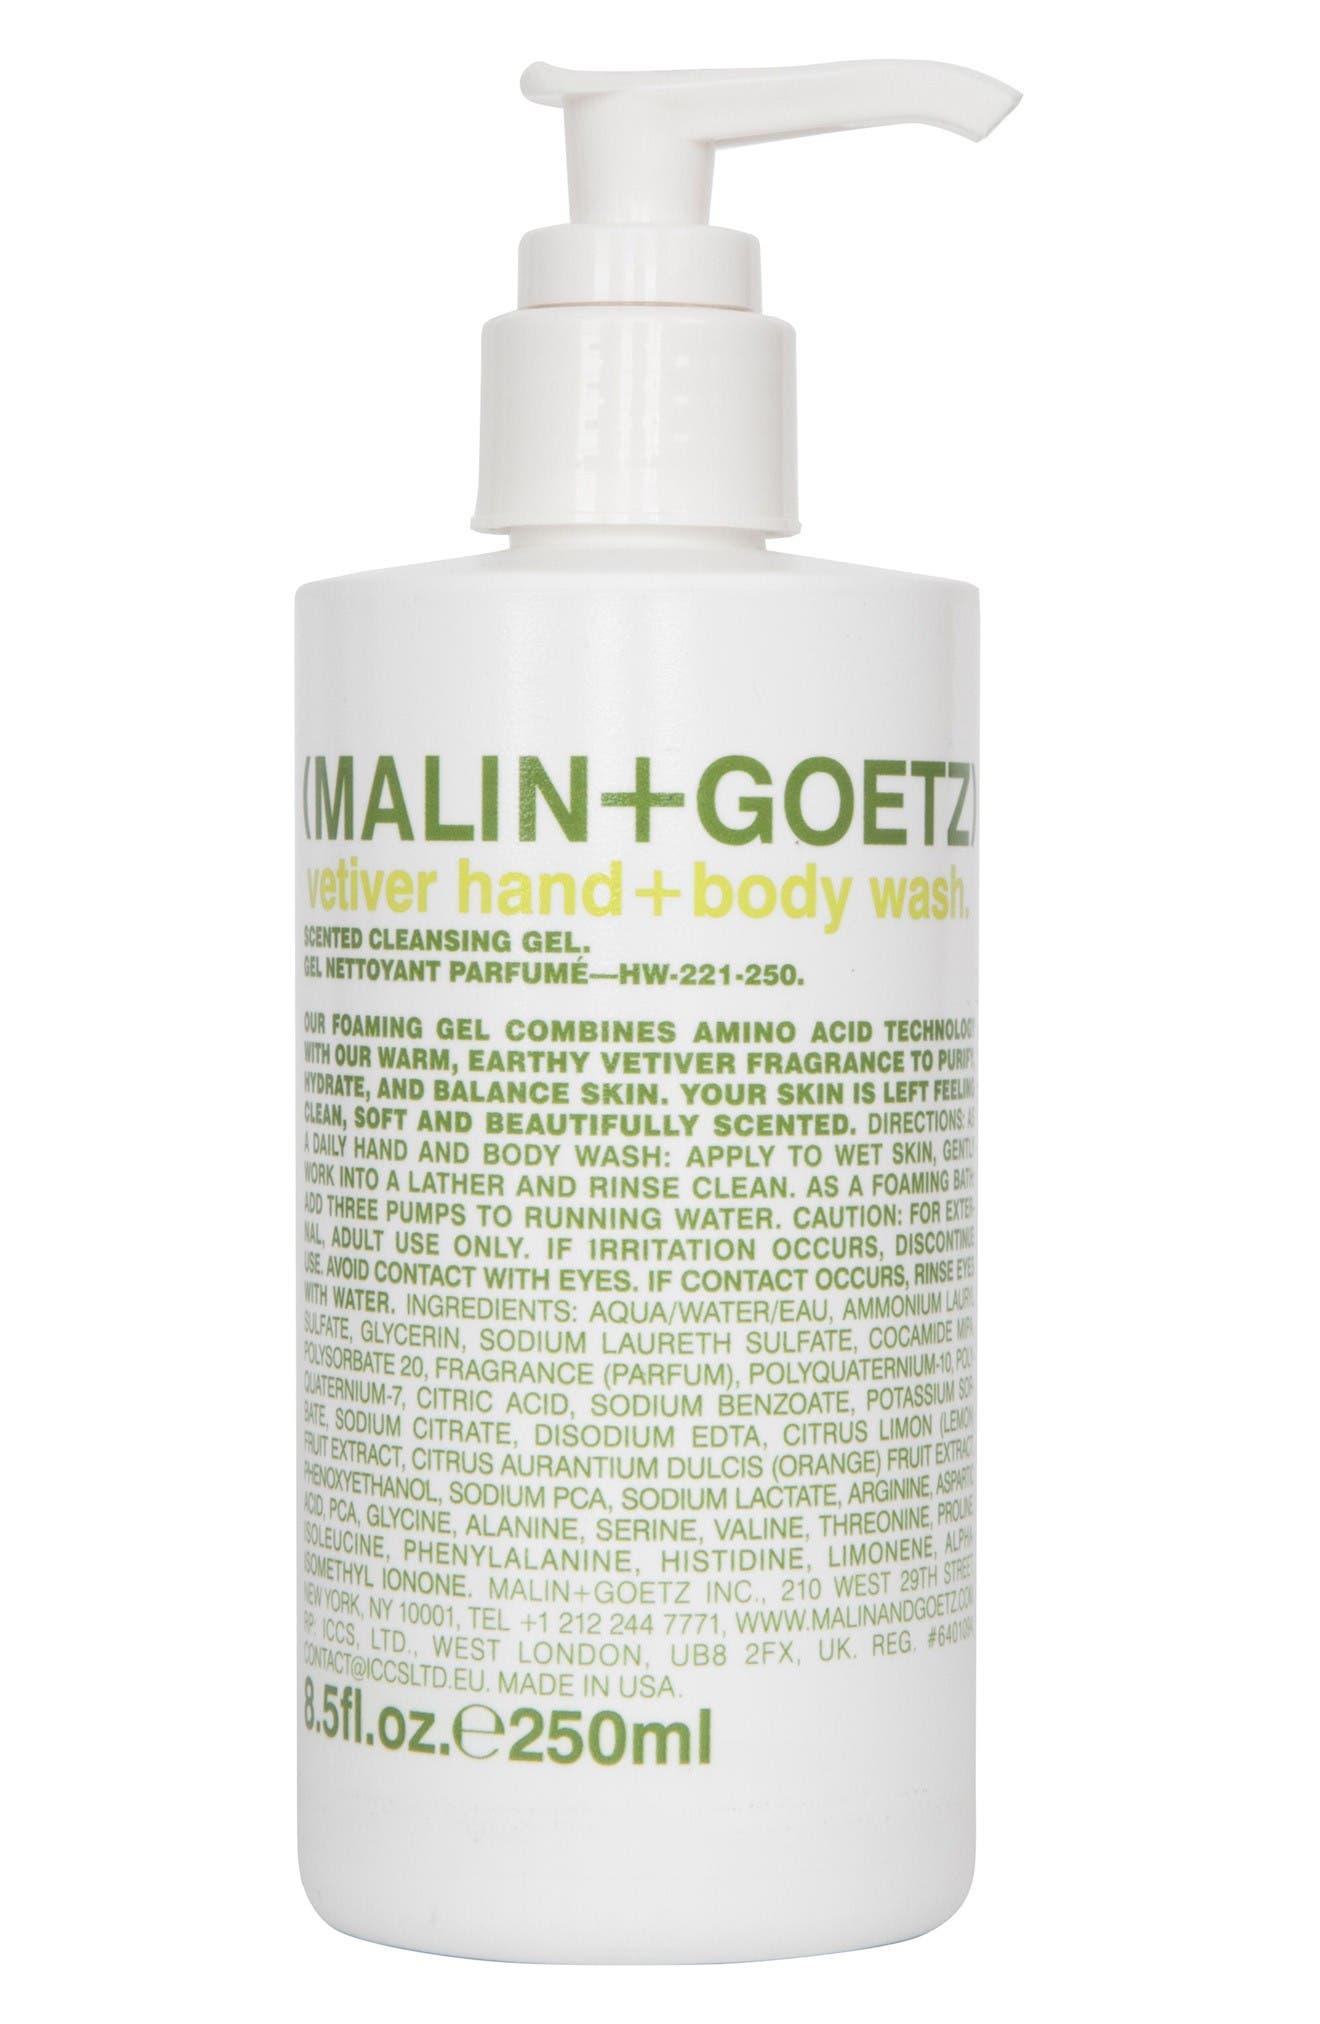 MALIN+GOETZ Vetiver Hand & Body Wash with Pump